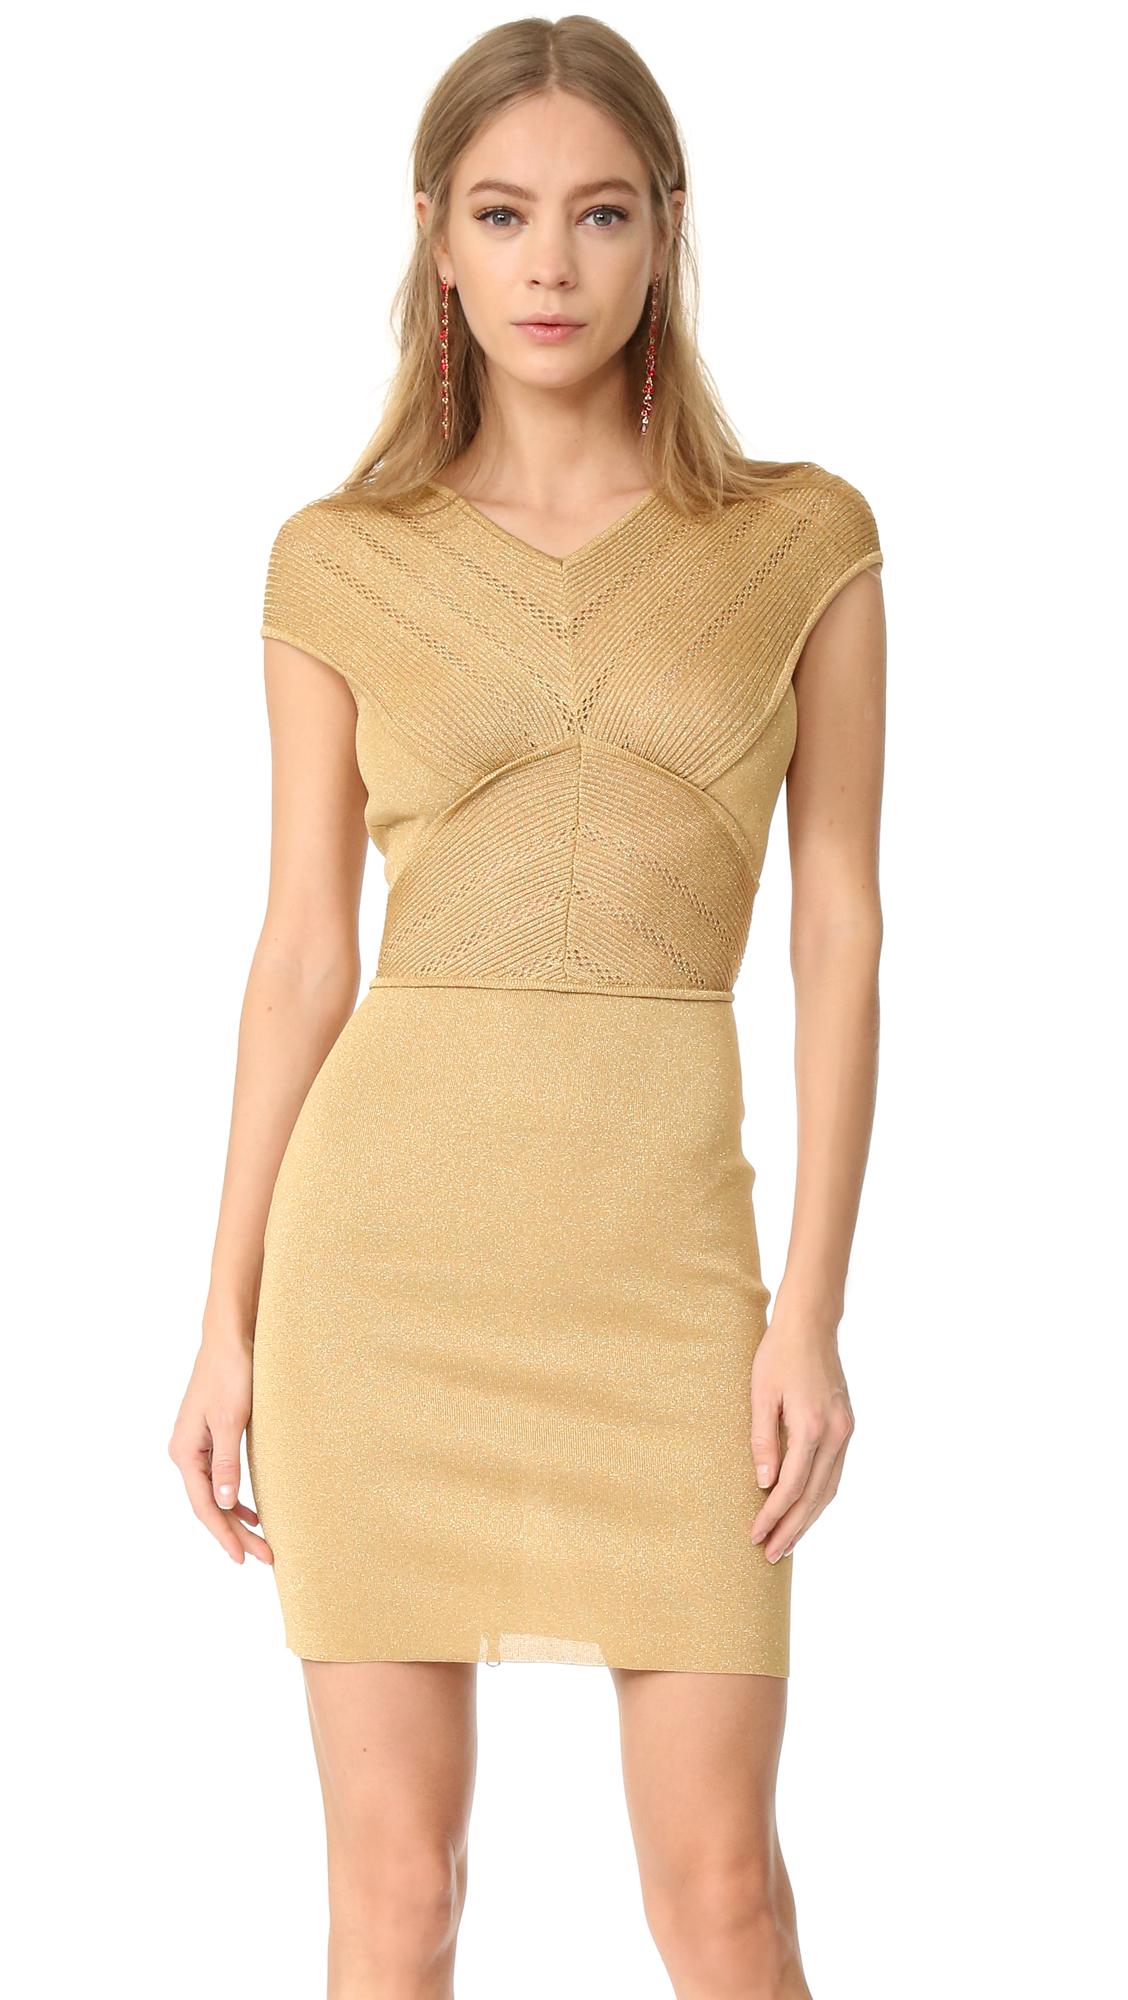 Antonio Berardi Sleeveless Dress - Oro at Shopbop